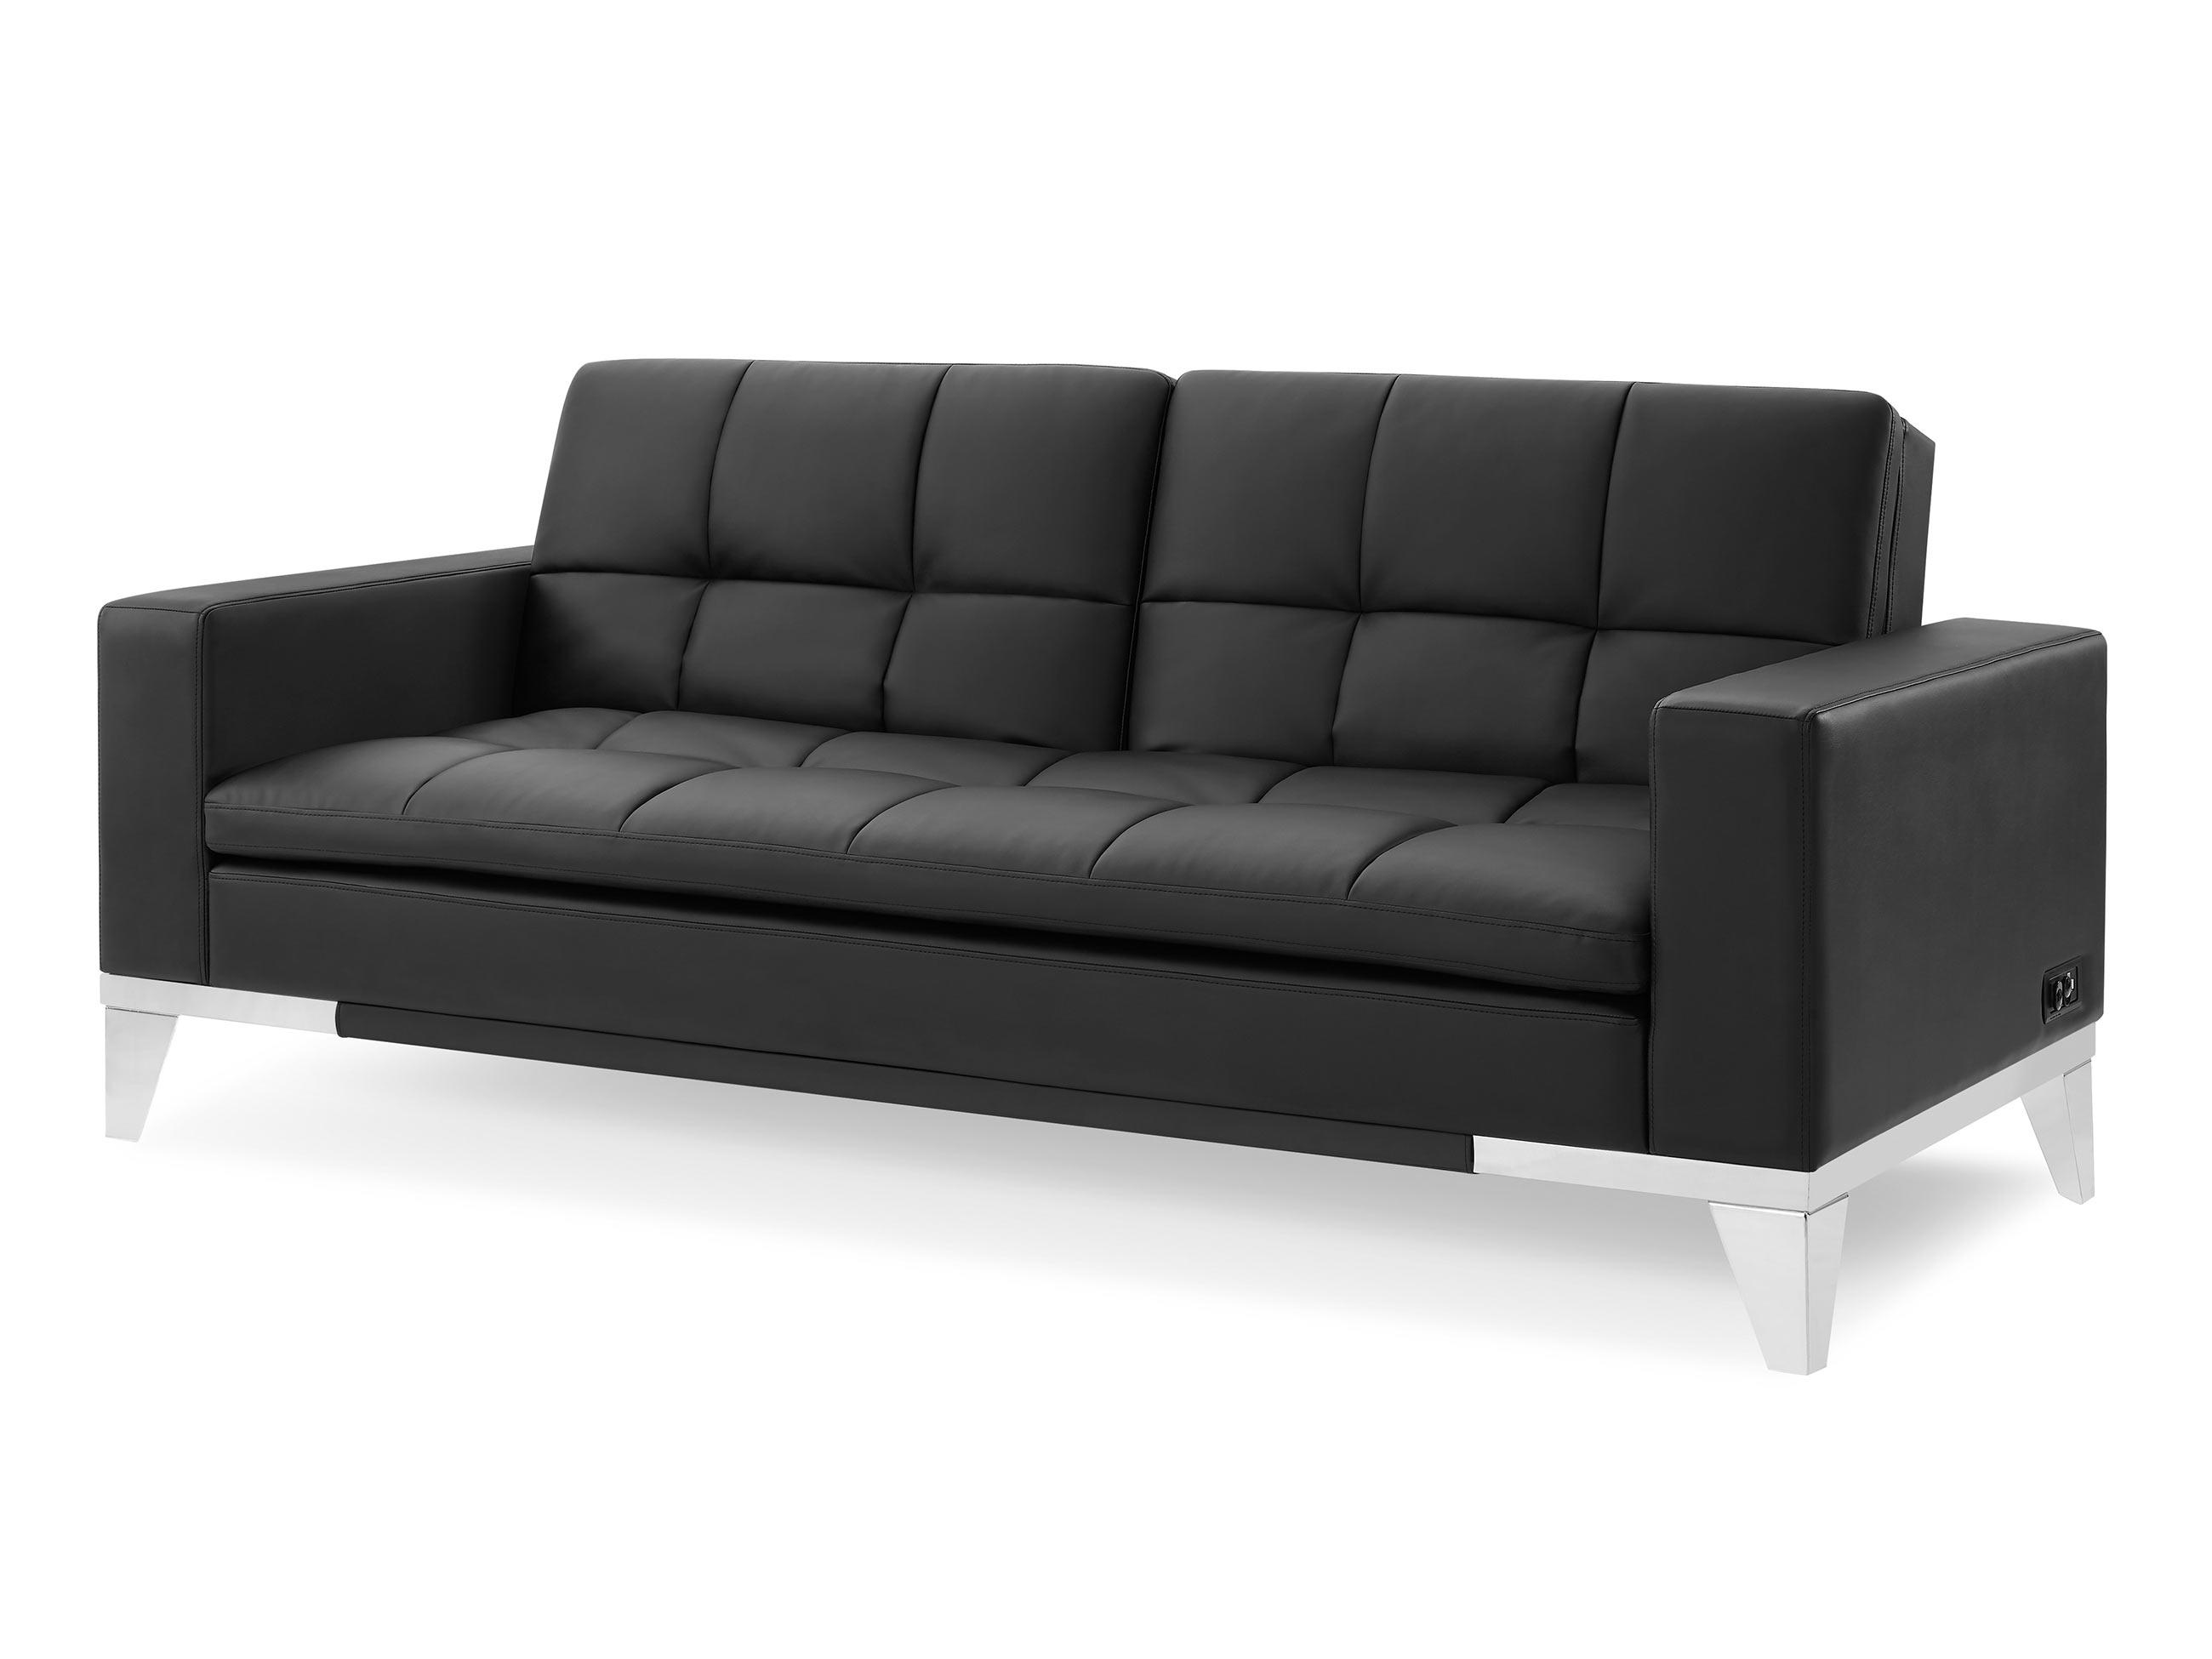 Westridge Convertible Sofa Black by Serta / Lifestyle